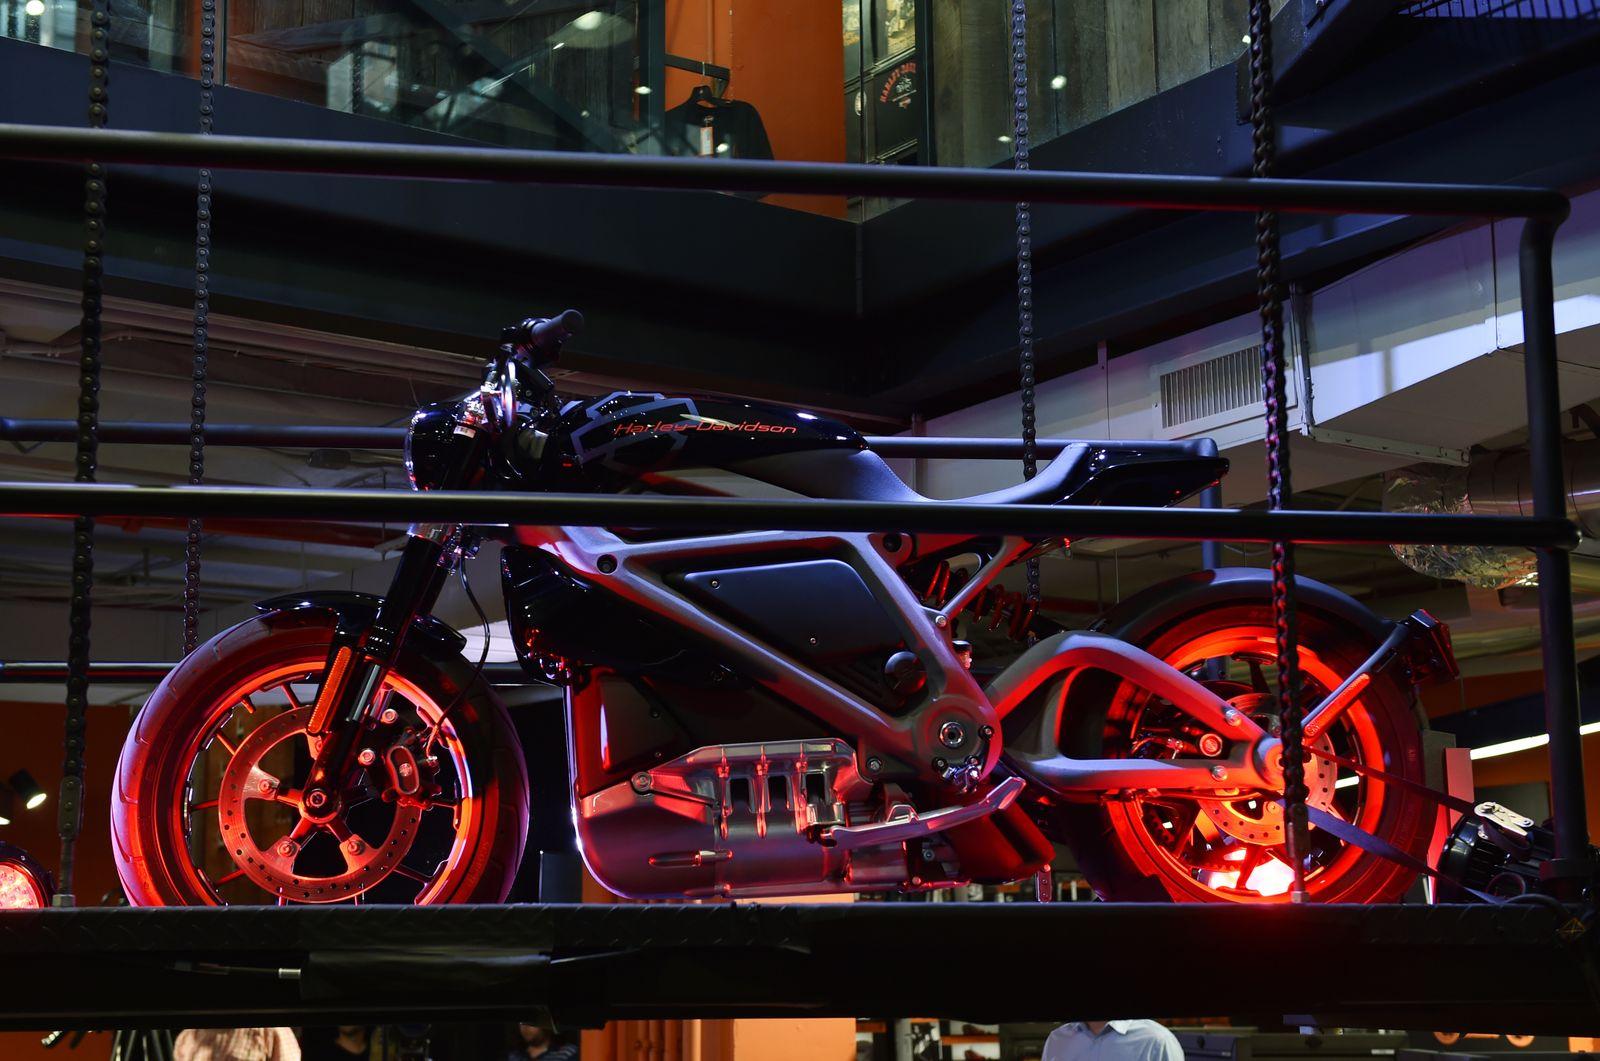 Harley Davidson / LiveWire